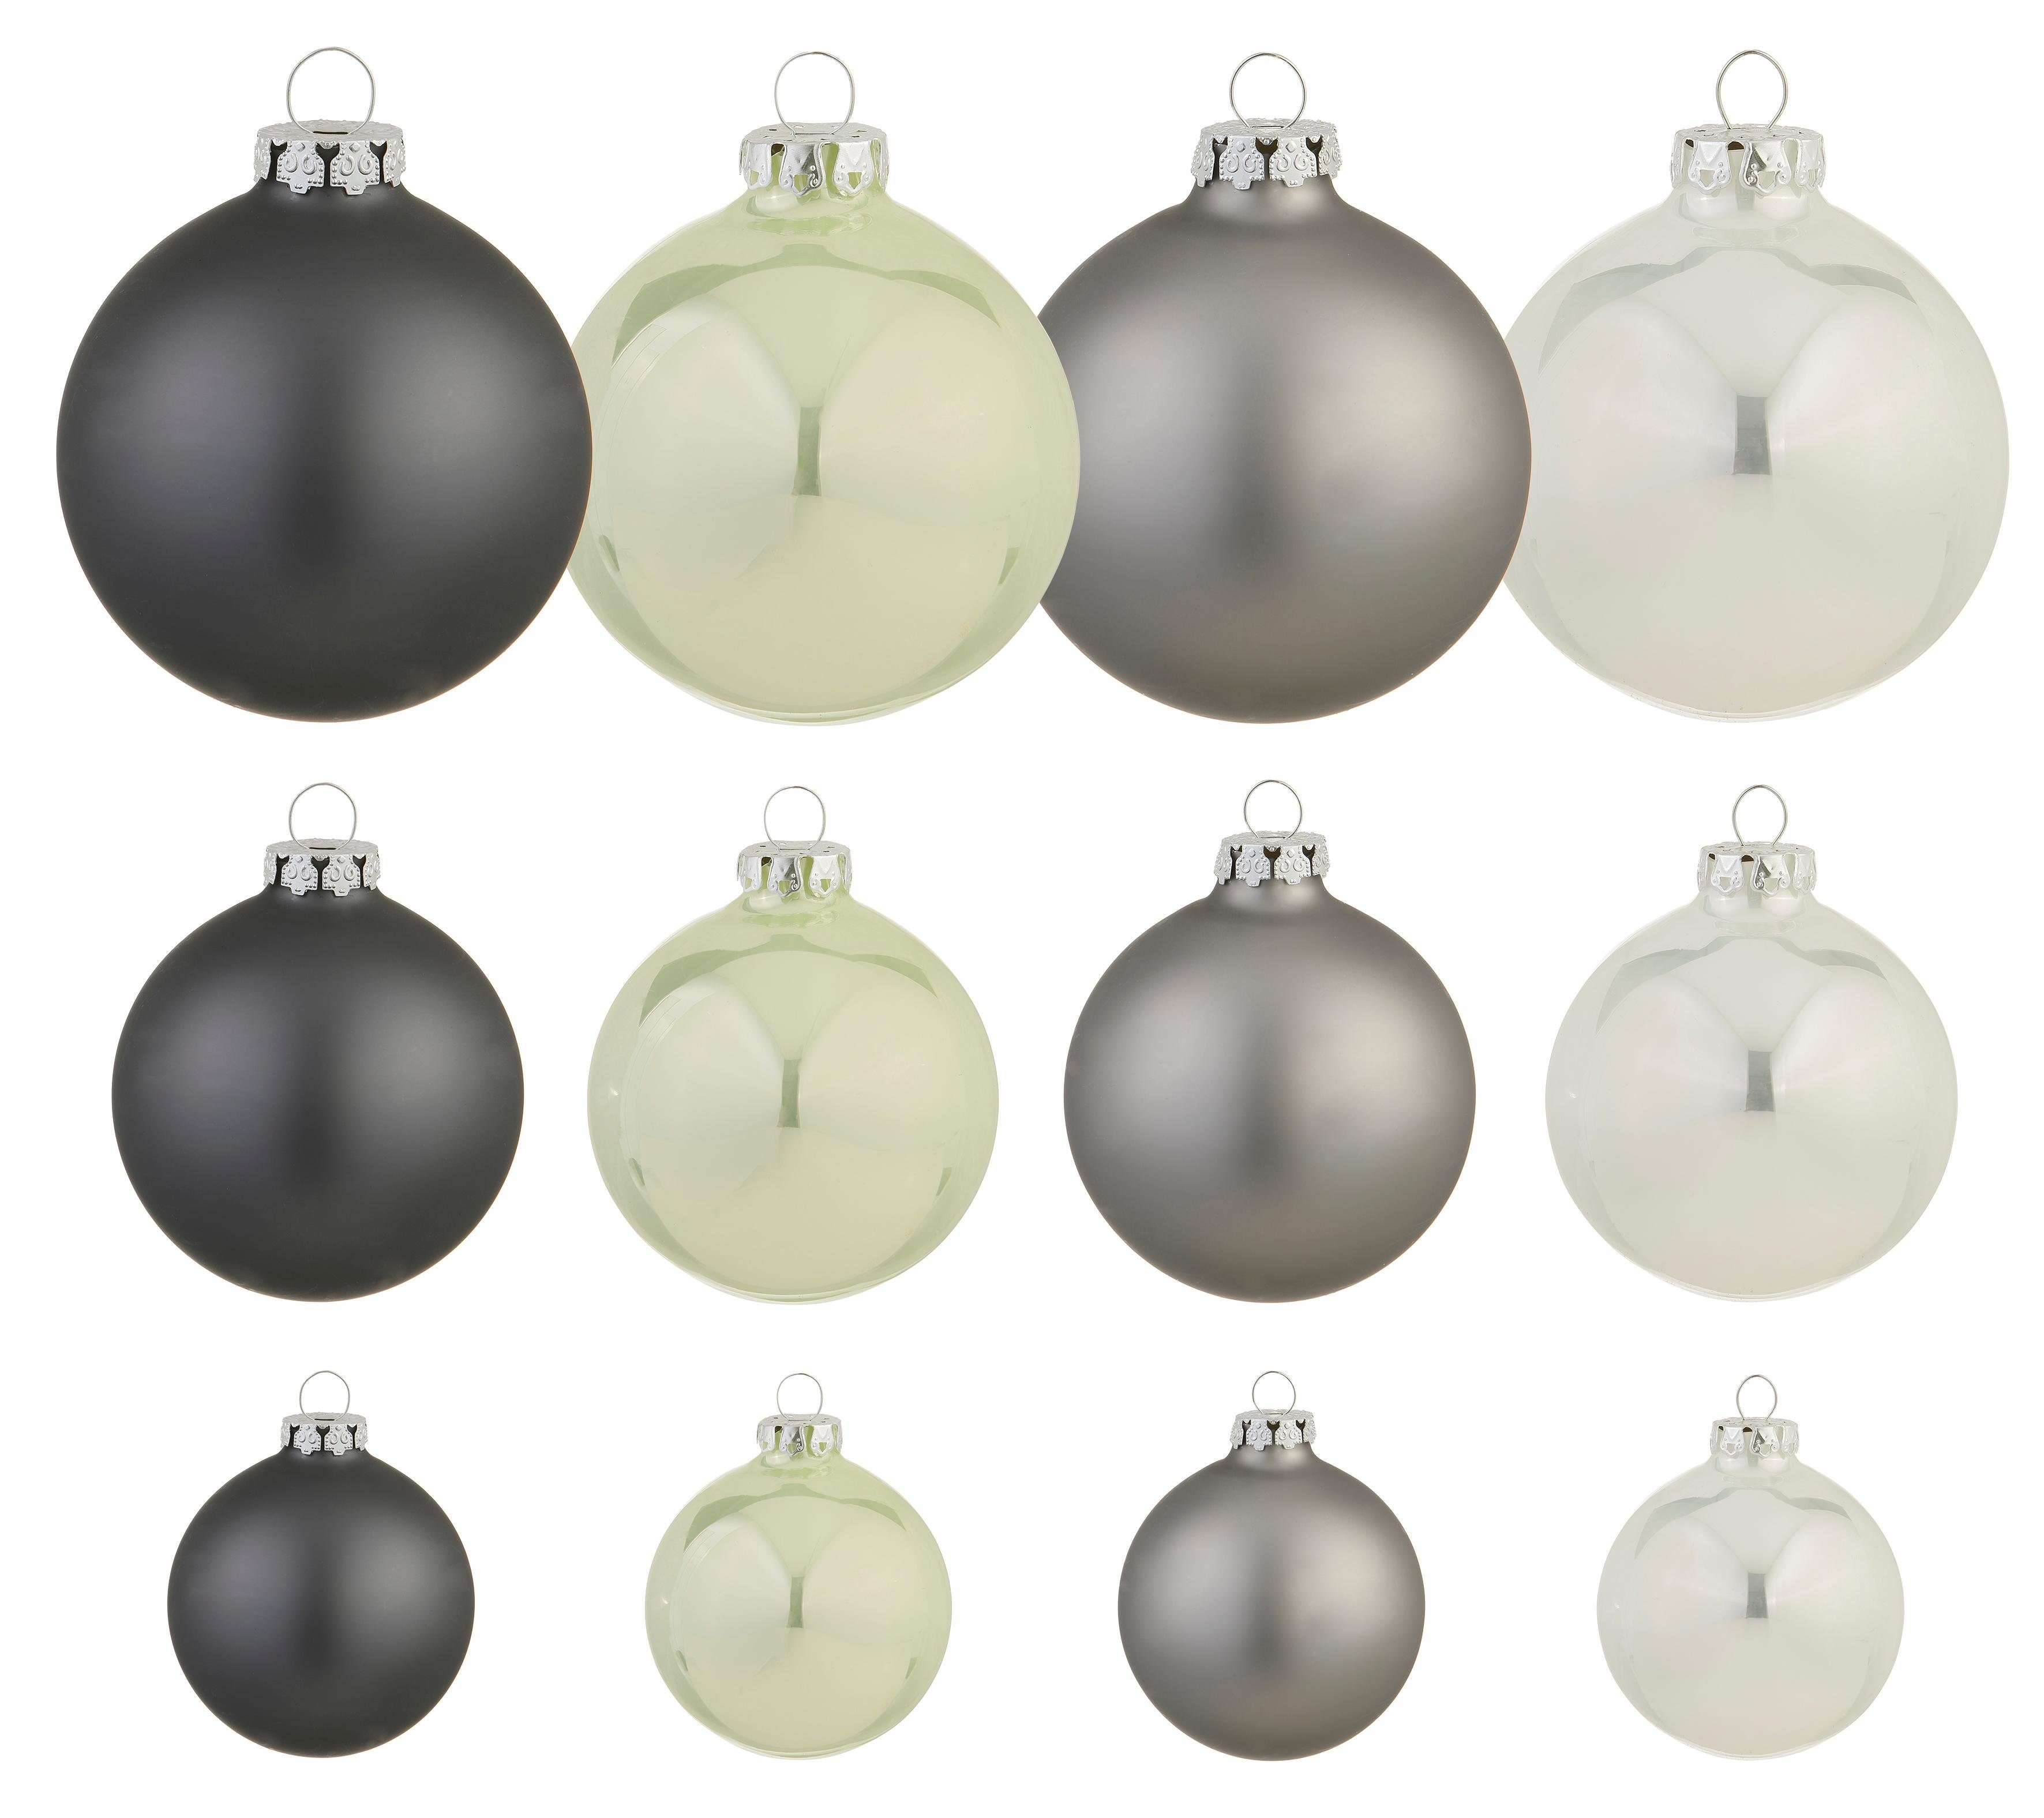 Thüringer Glasdesign TGS-Weihnachtskugeln, (40-teilig.), »Frozen Christmas«